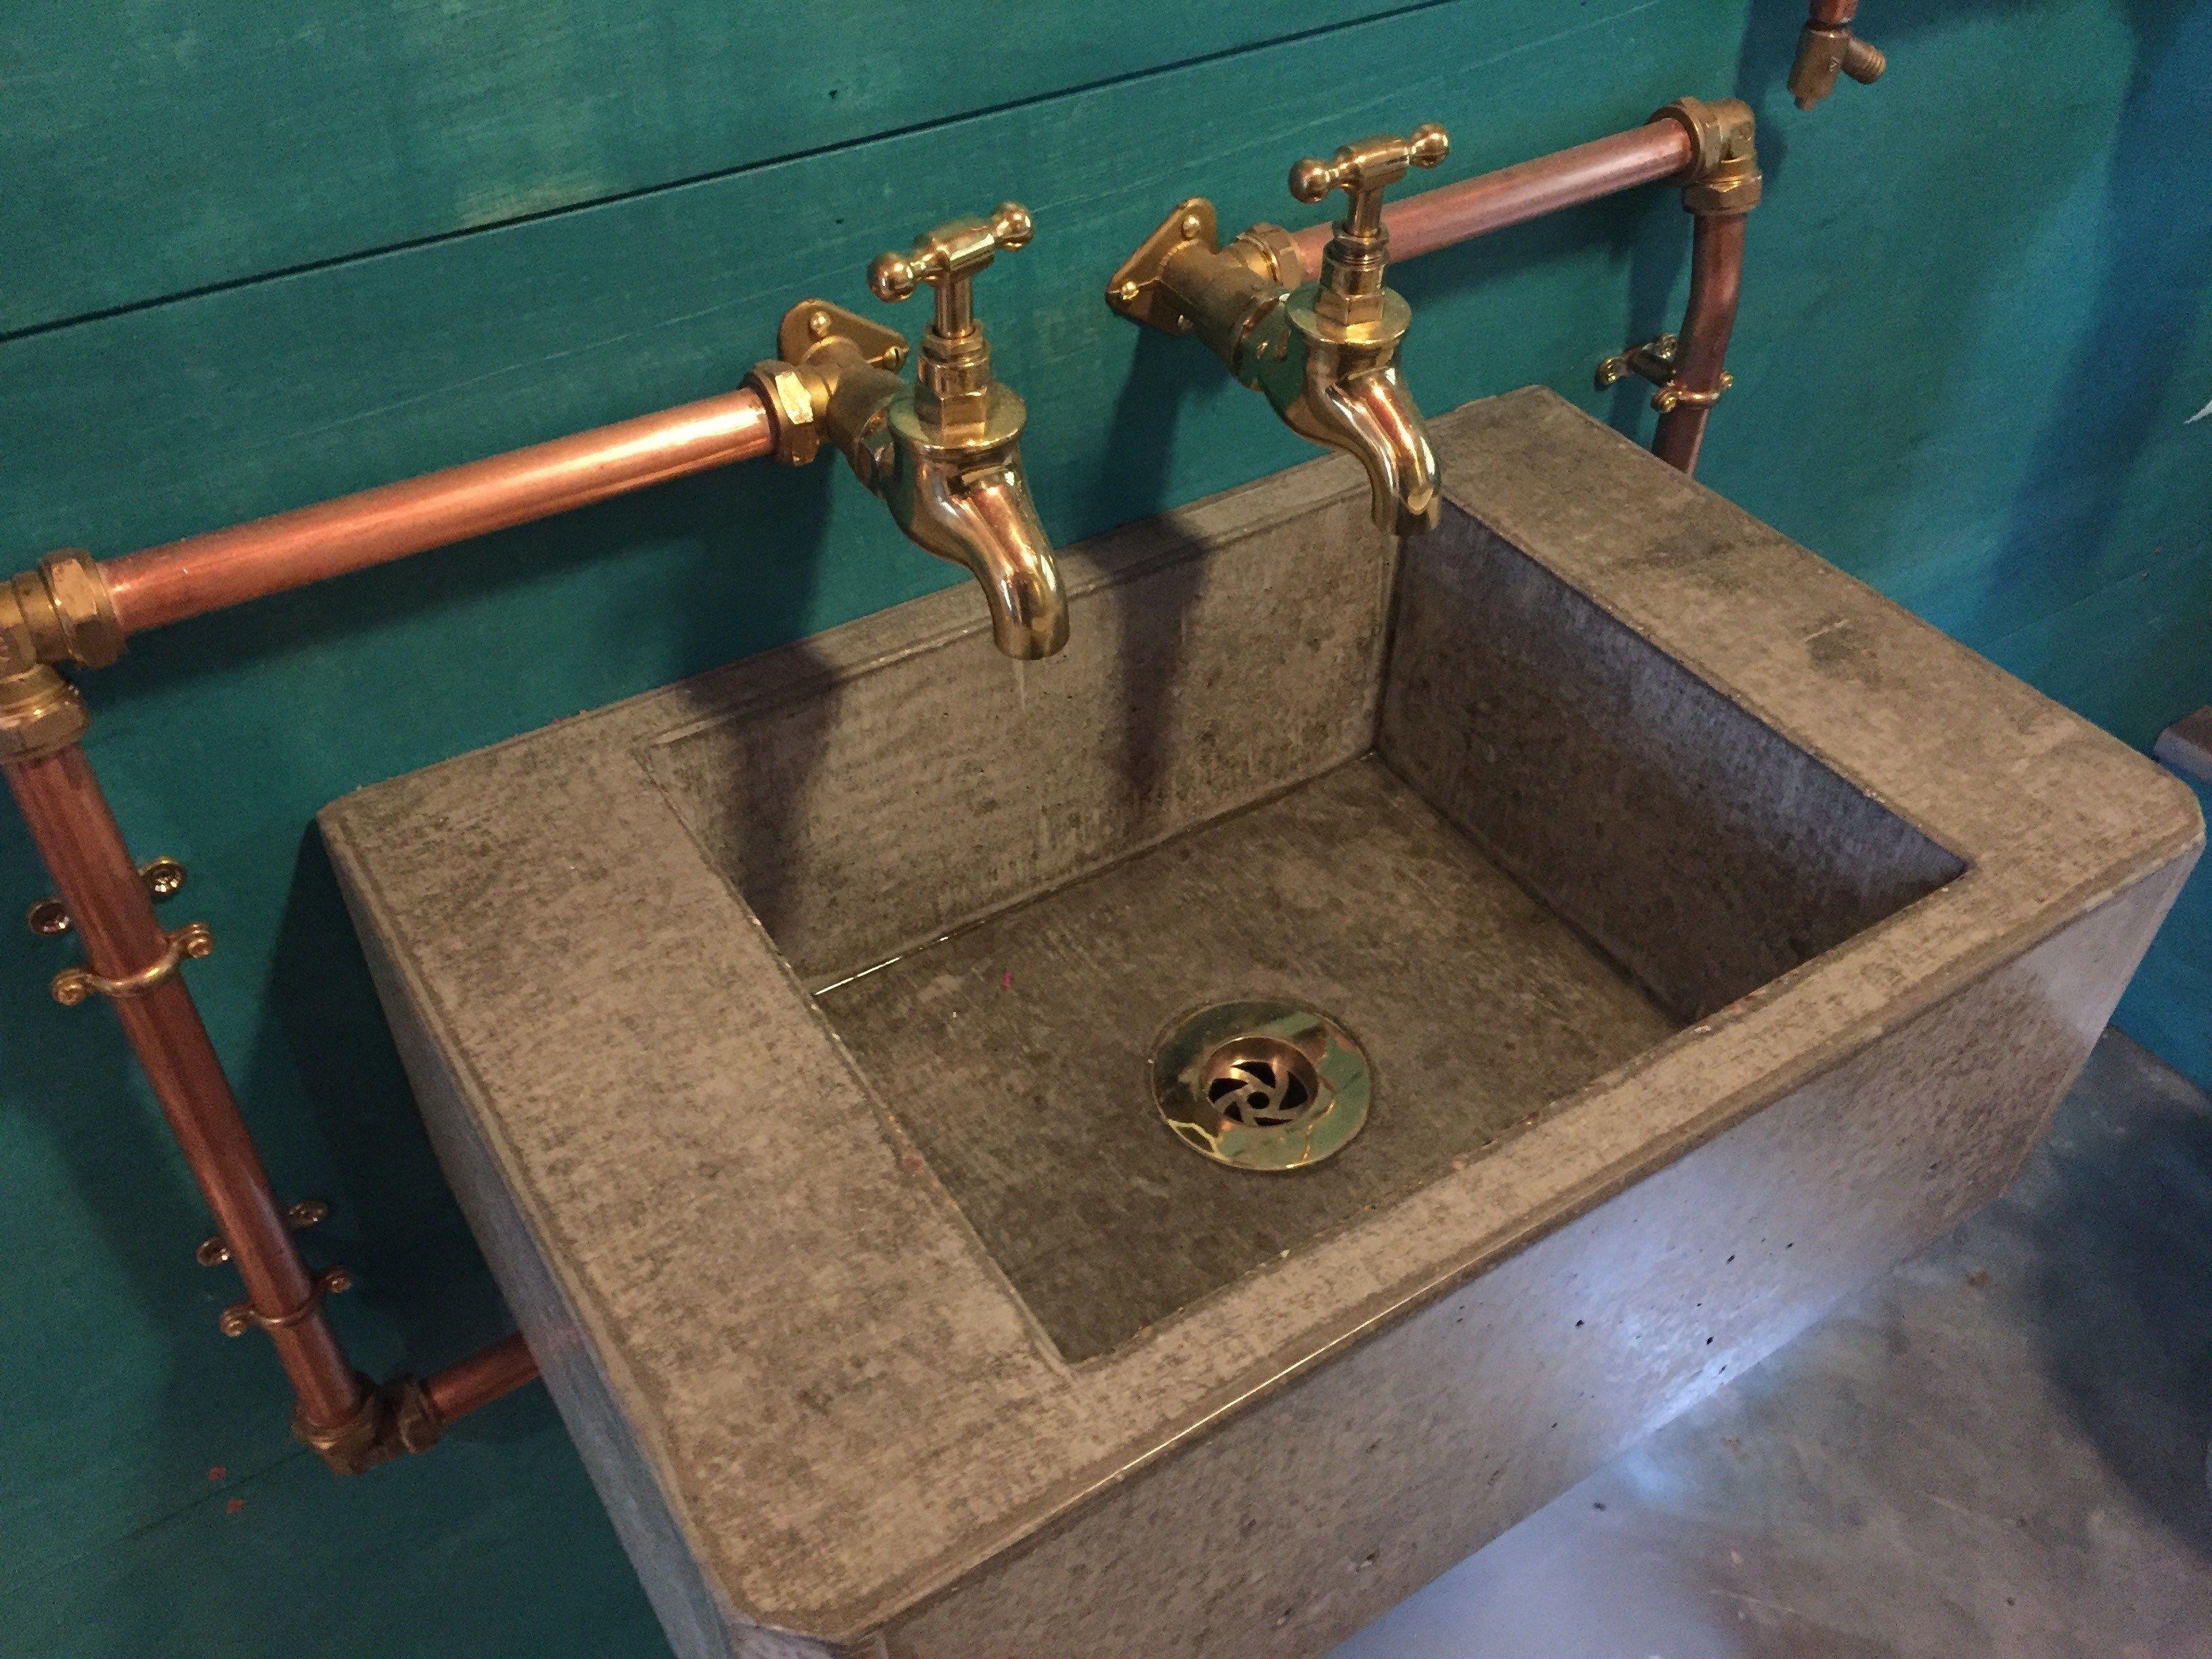 Best 25 Steampunk Bathroom Ideas Only On Pinterest Concrete Sink Industrial Bathroom Rustic Bathrooms [ 2448 x 3264 Pixel ]